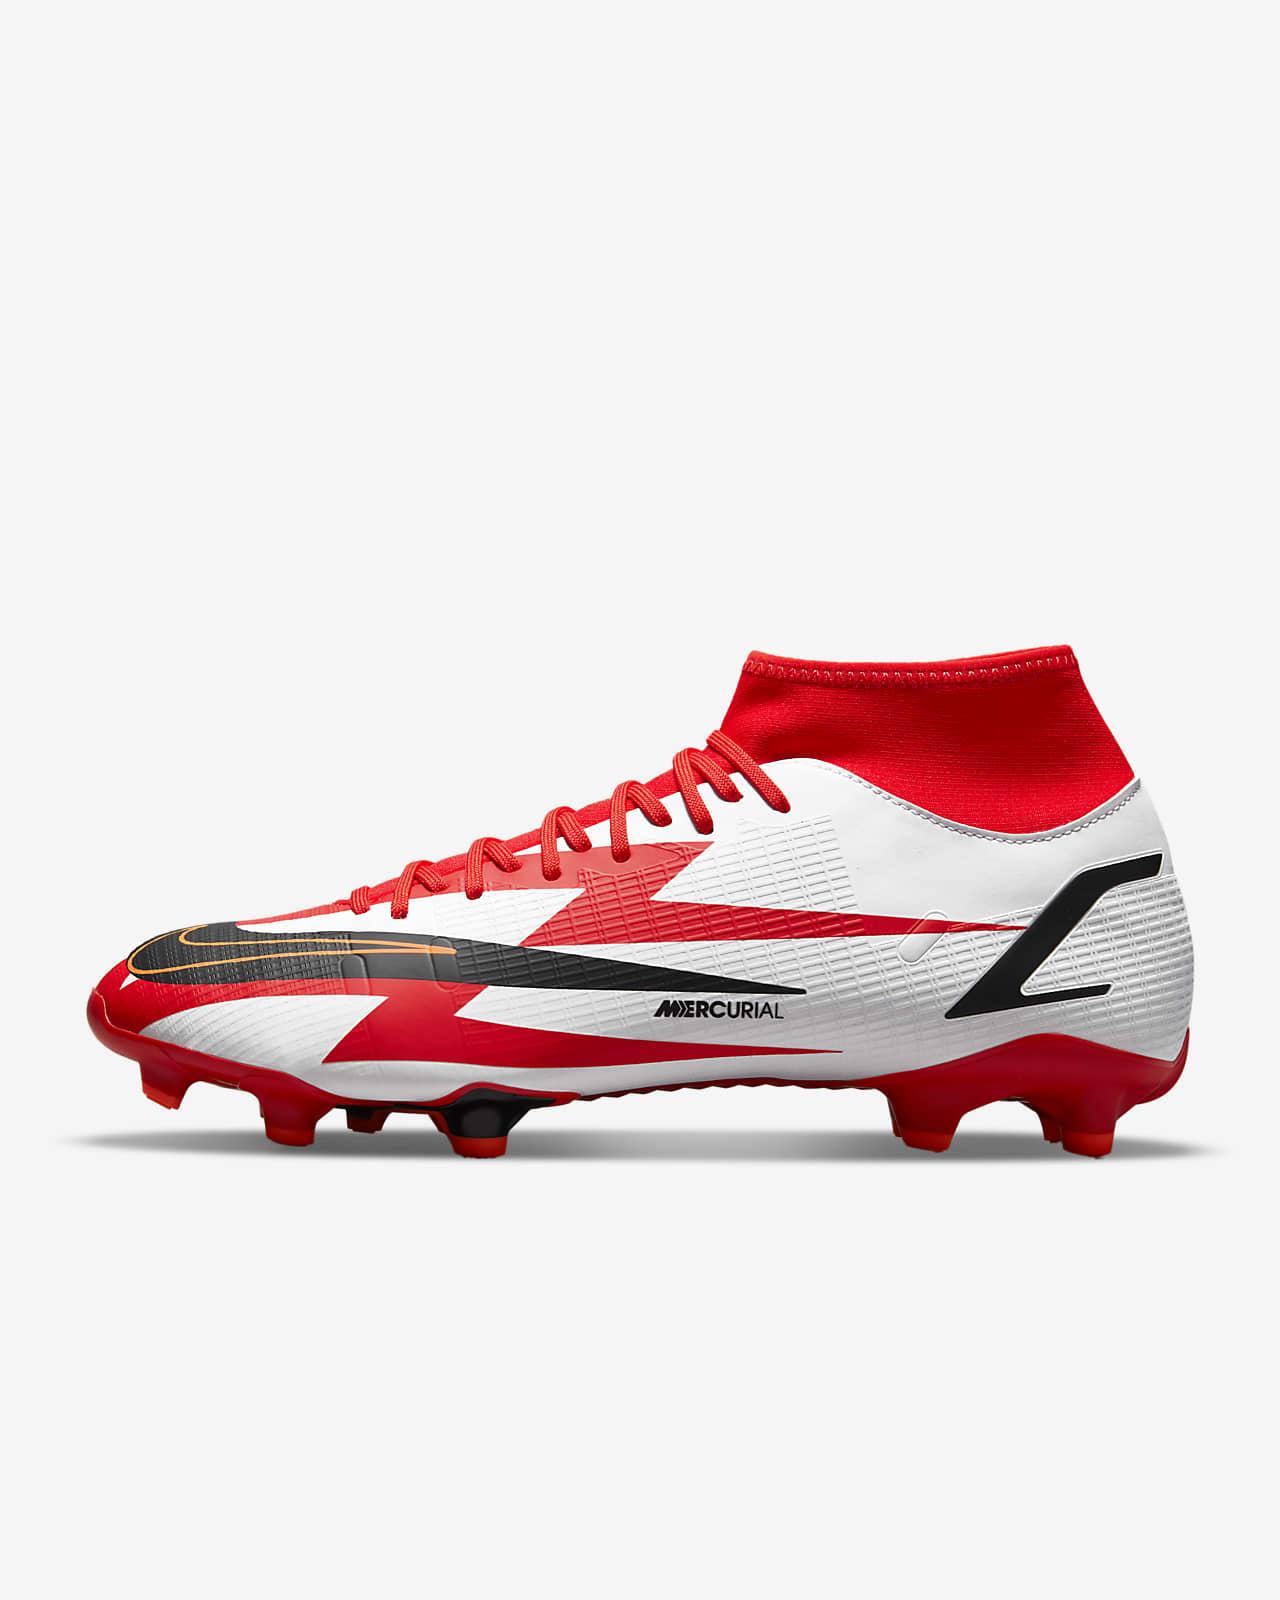 Nike Mercurial Superfly 8 Academy CR7 MG Multi-Ground Football Boot